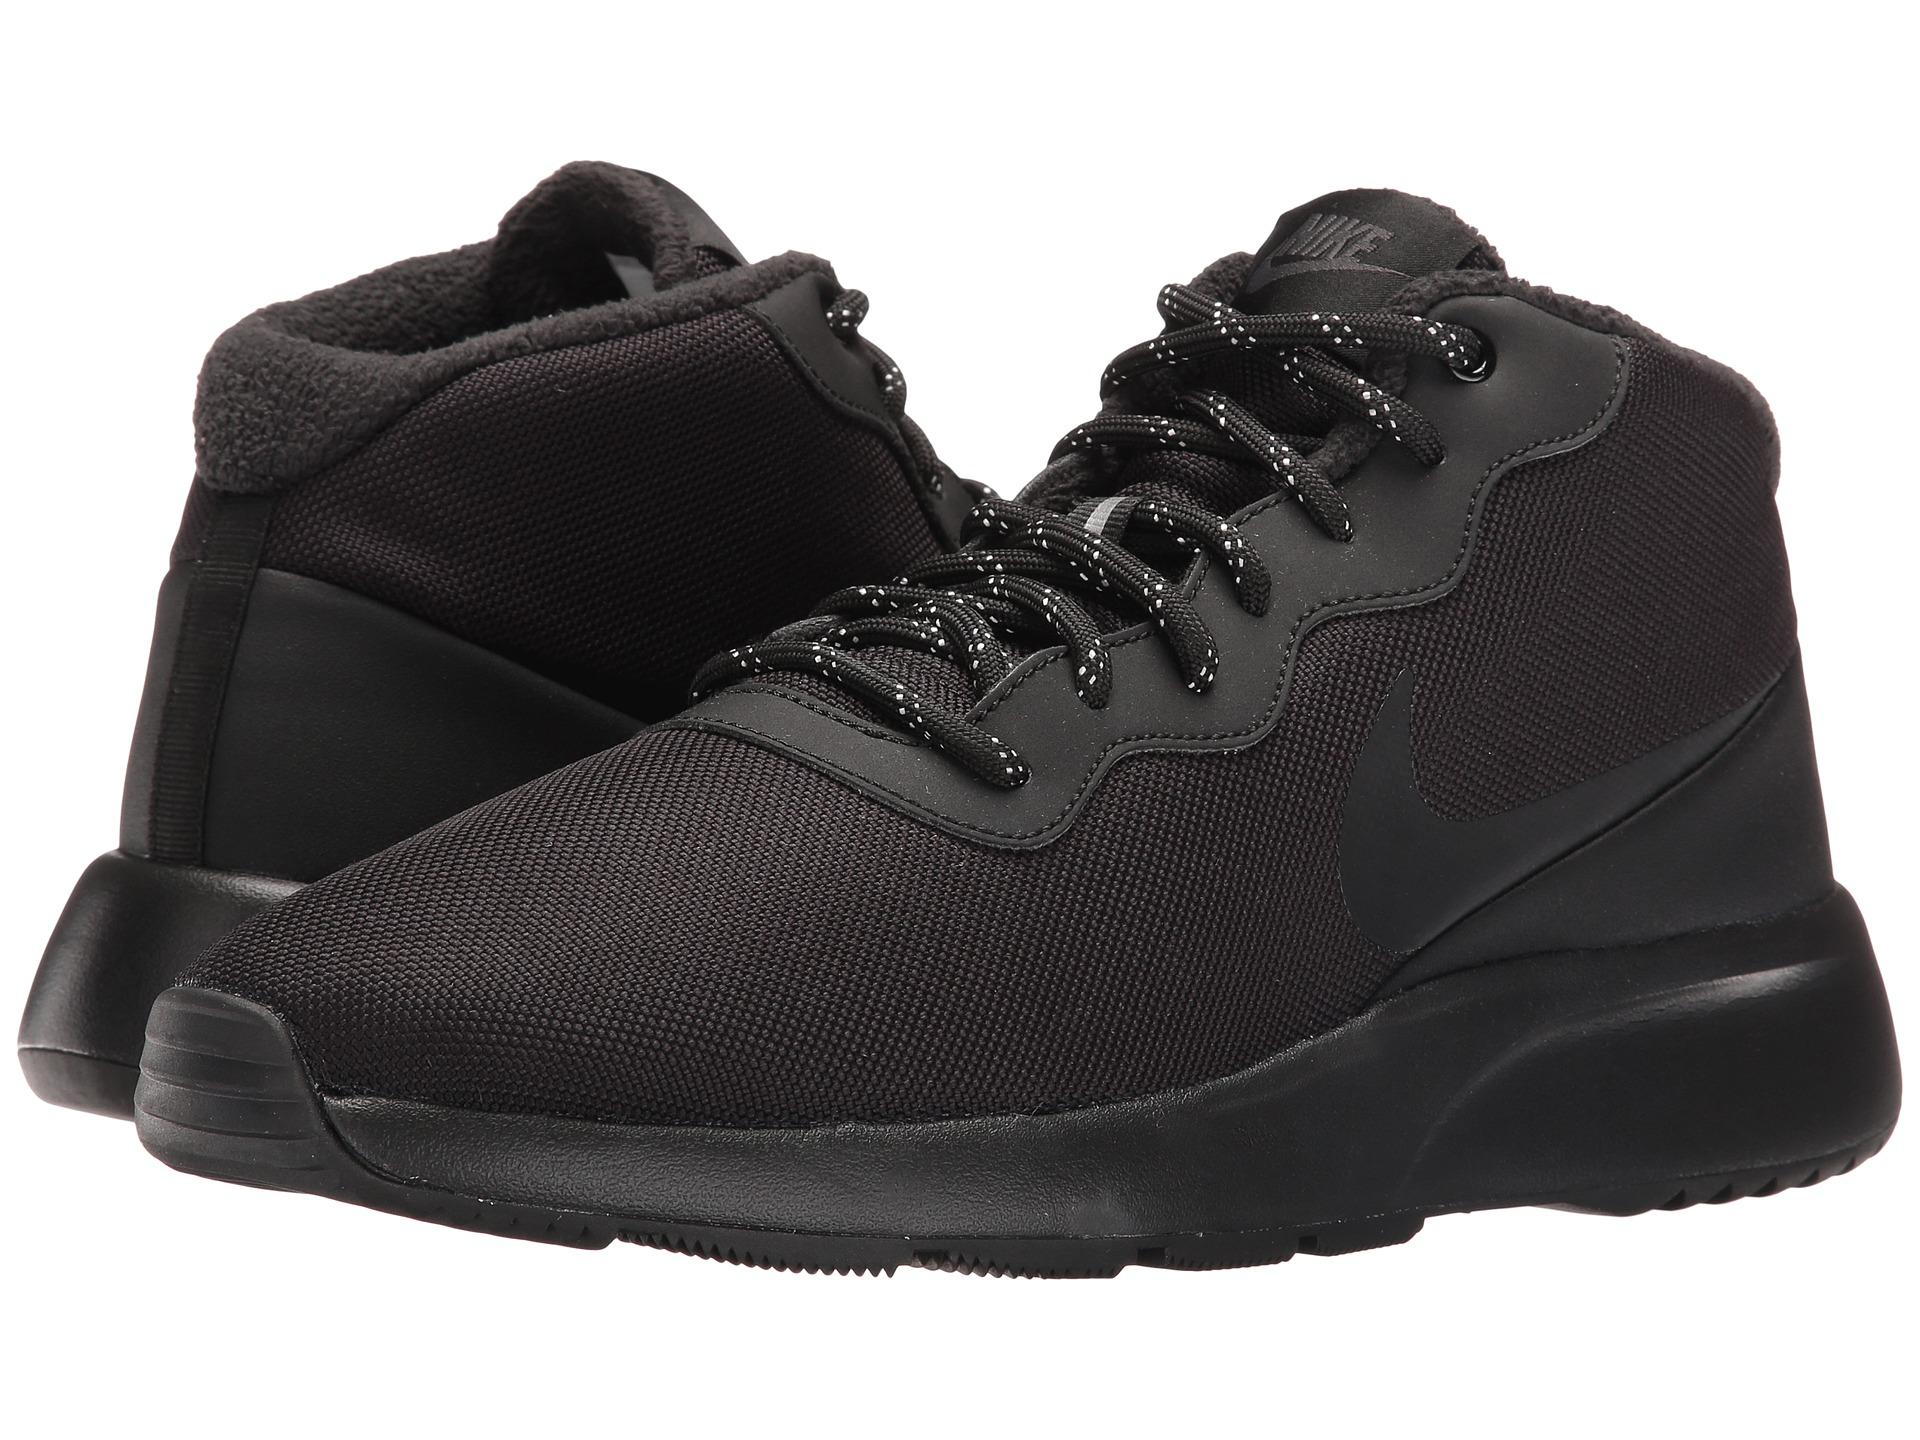 Lyst - Nike Tanjun Chukka in Black for Men 8f9179a64